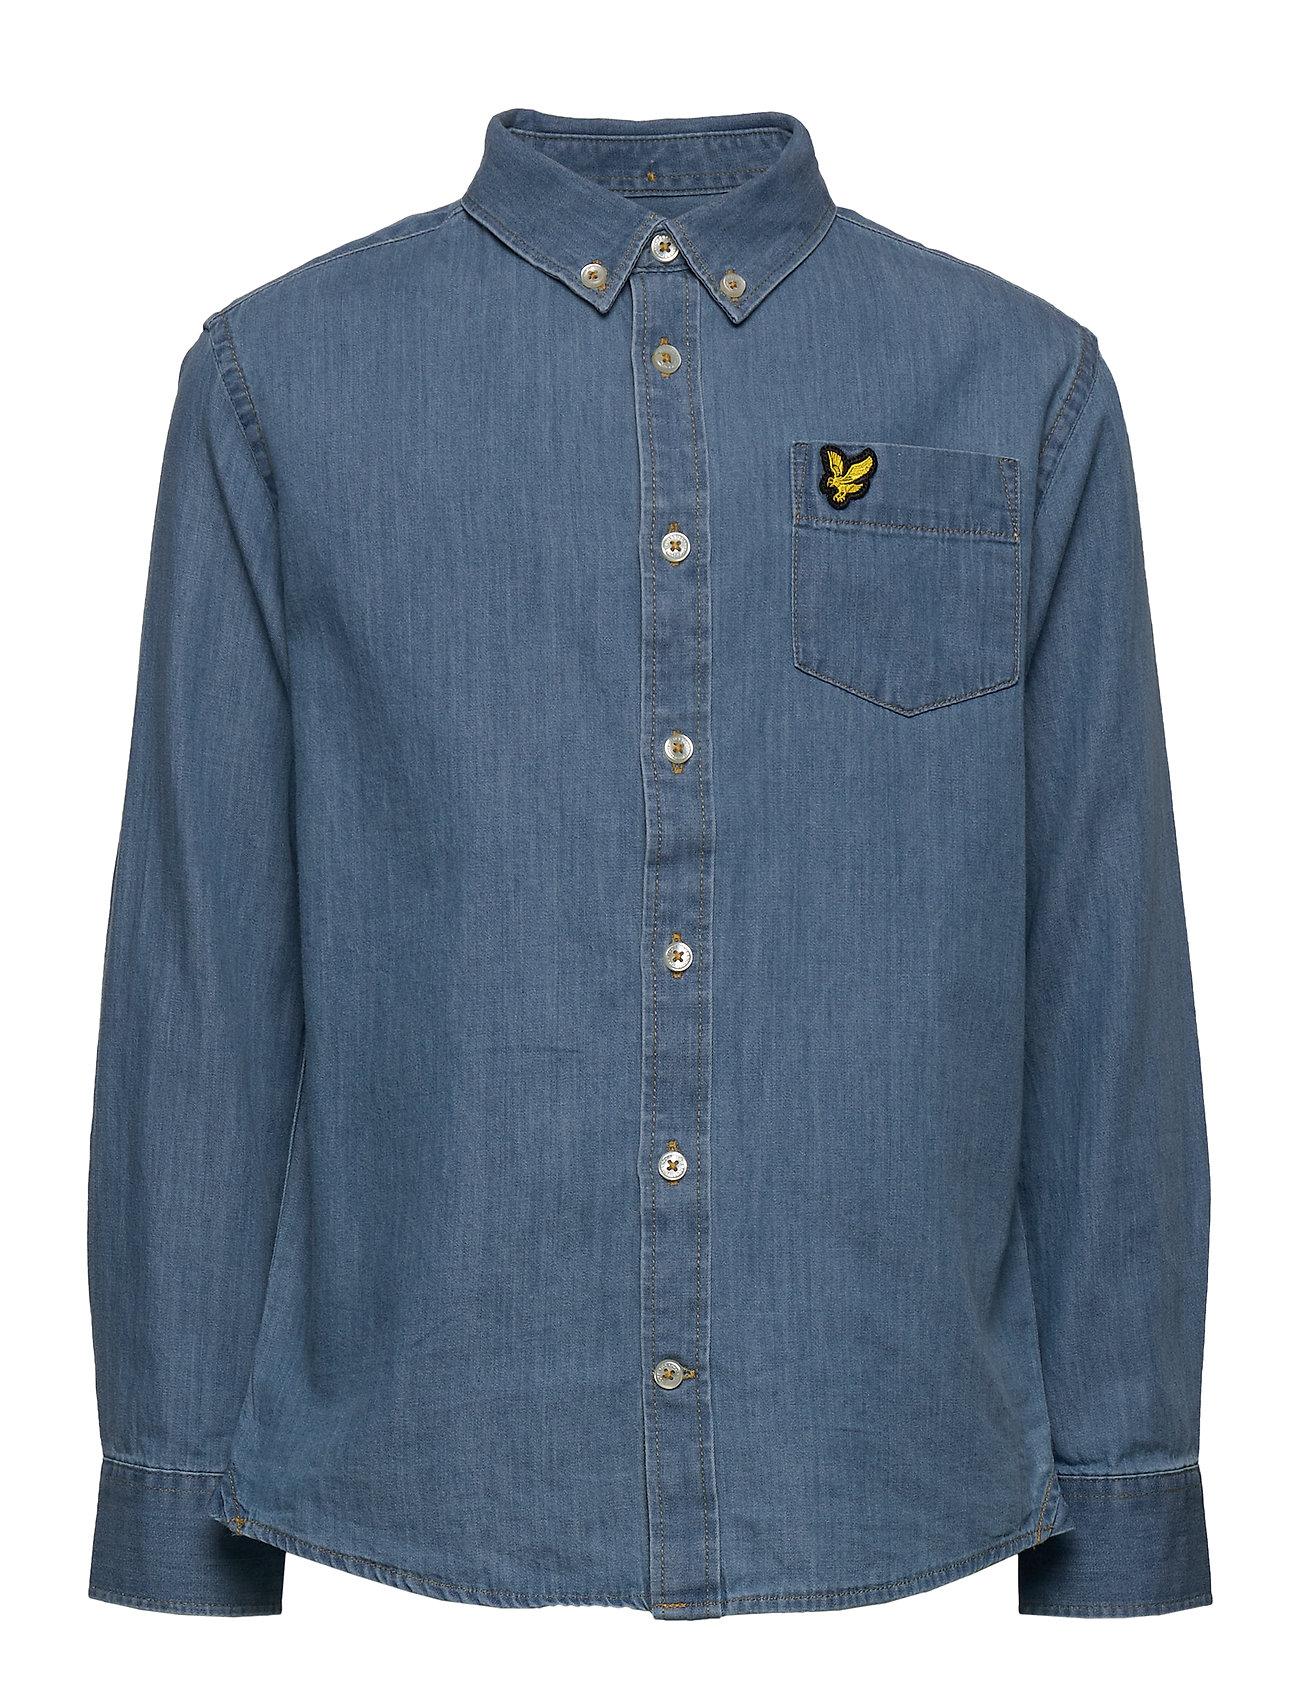 Lyle & Scott Junior Chambray Shirt Light Chambray Blue - LIGHT CHAMBRAY BLUE